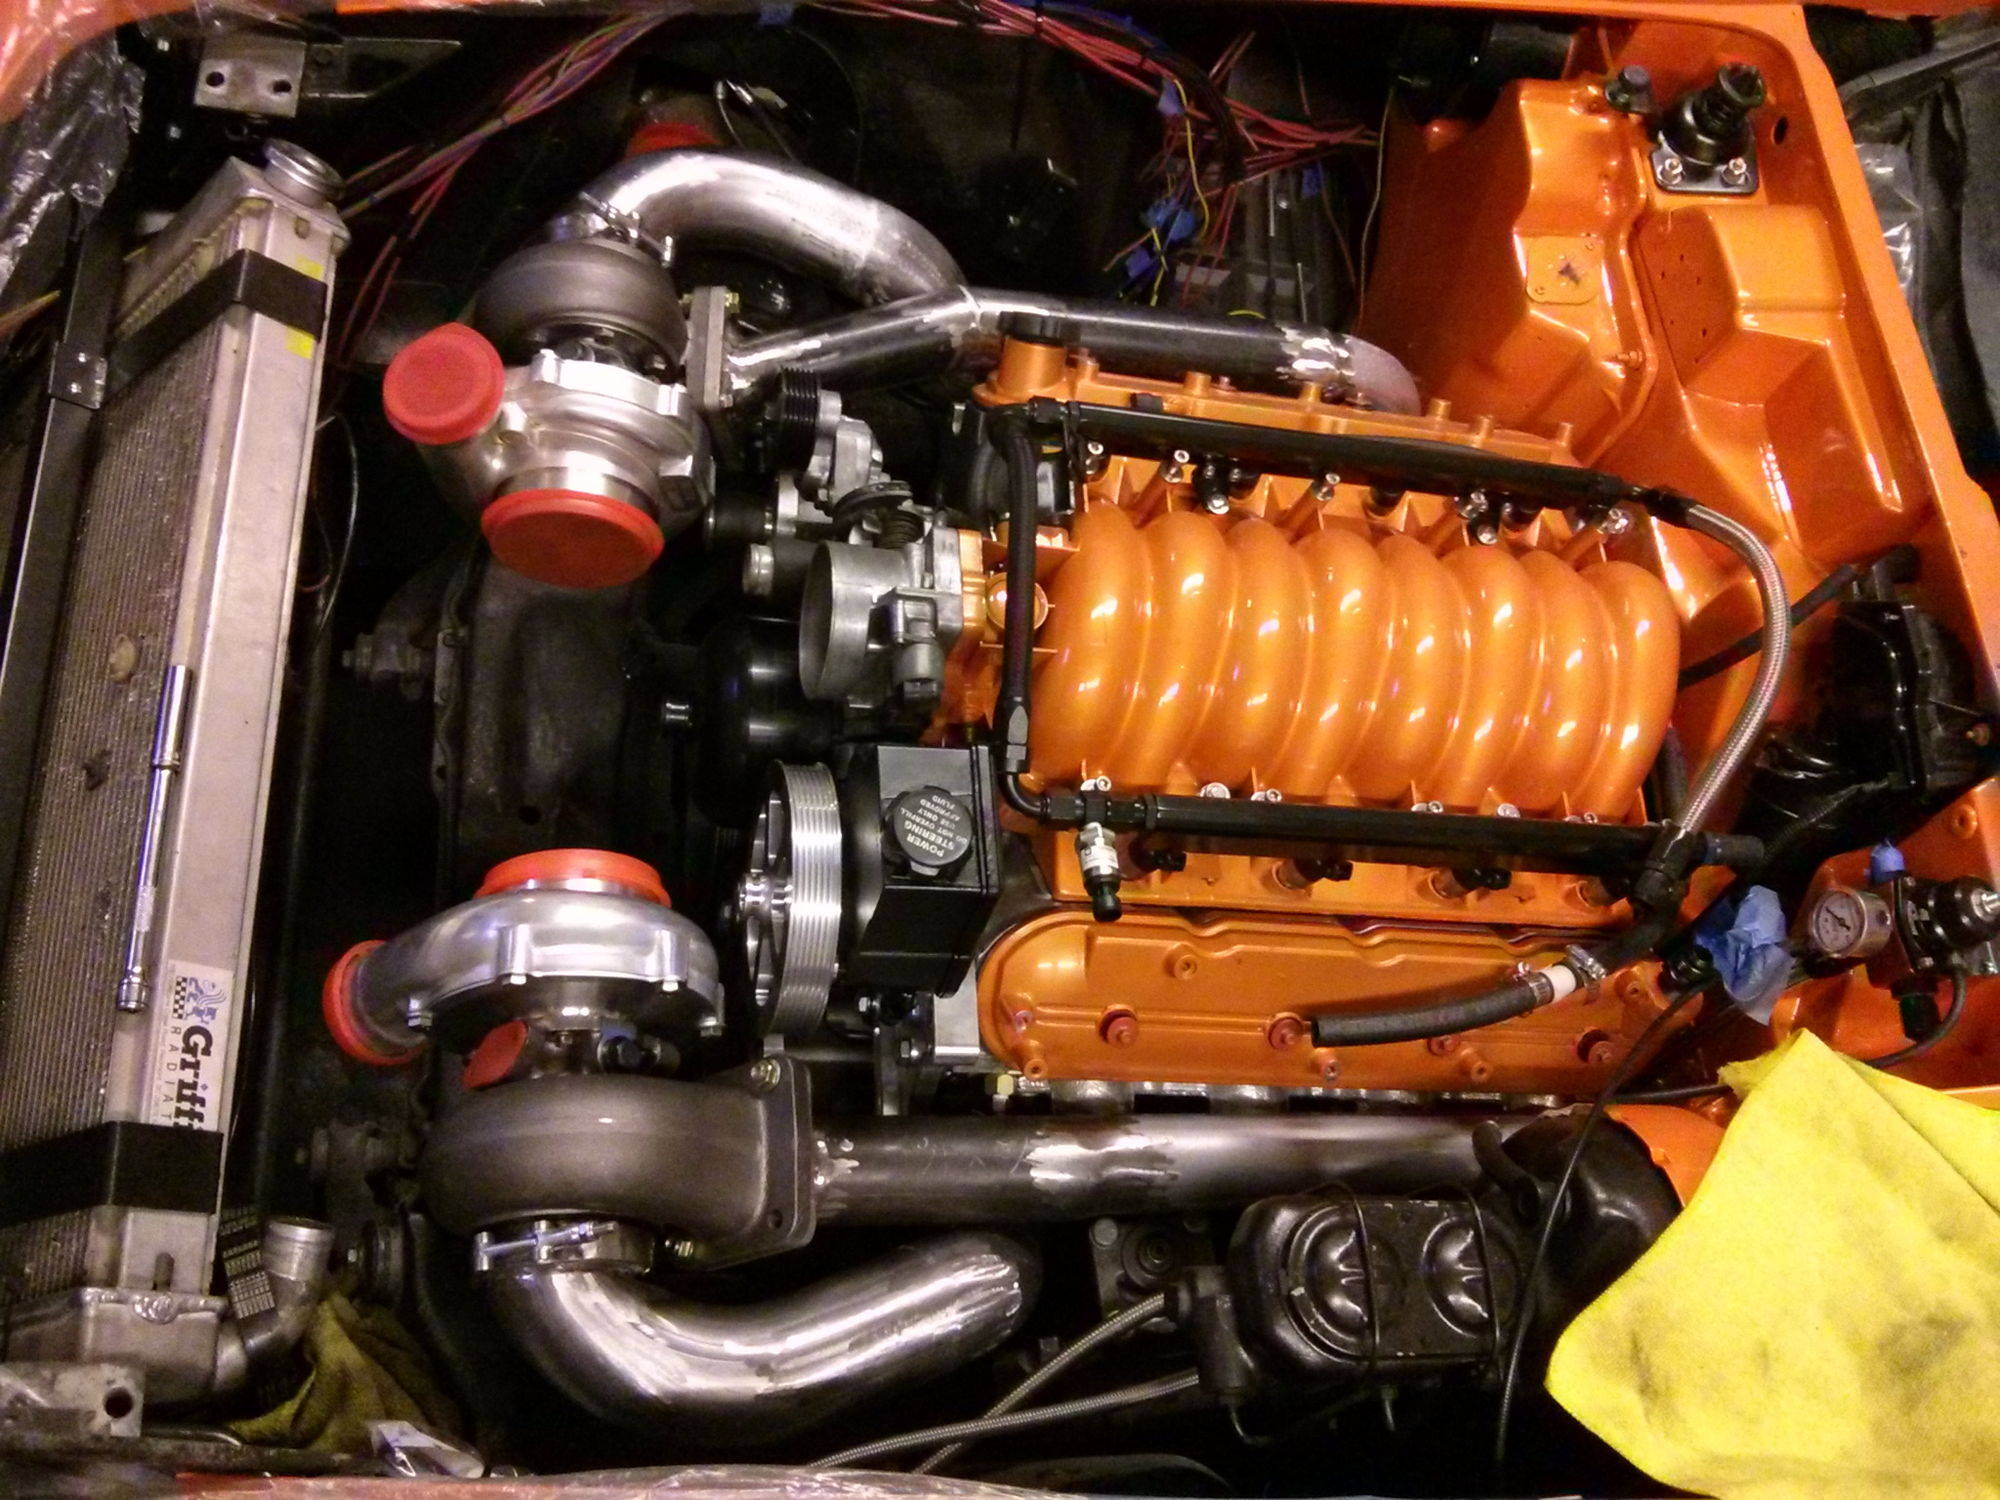 Twin Turbo C3 Vette Build In Progress Ls1tech Camaro